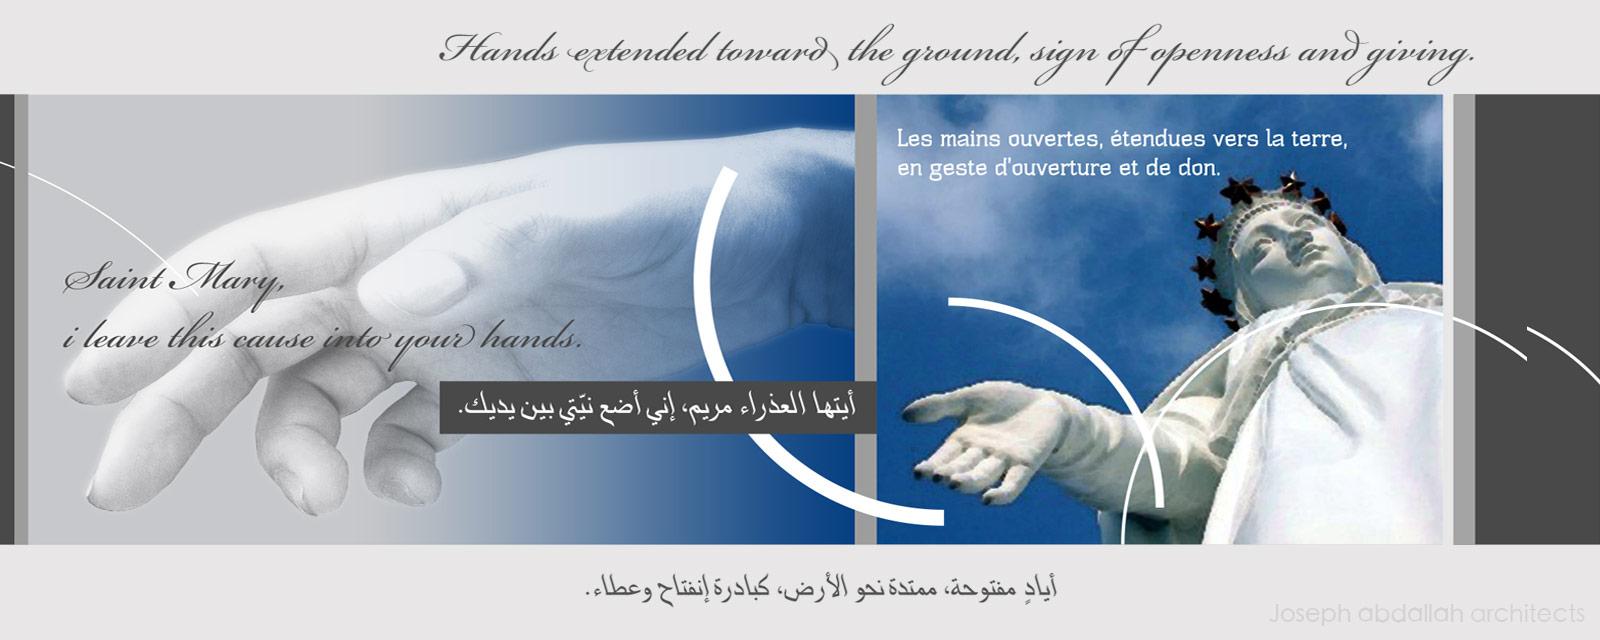 harissa-notre-dame-of-lebanon-shrink-architecture-joseph-abdallah-architects-1g